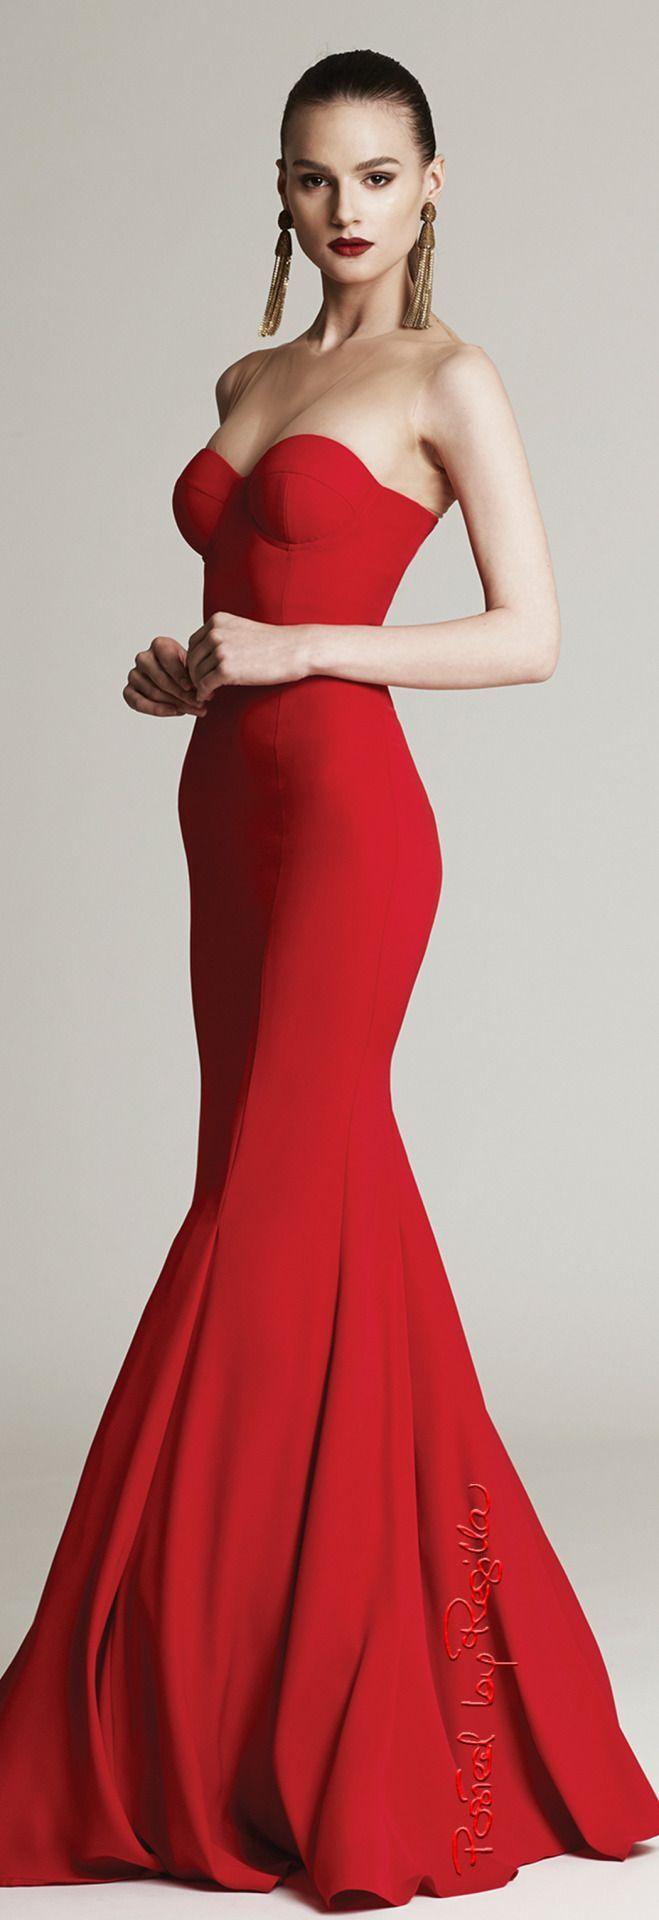 Red dress day 2017 550